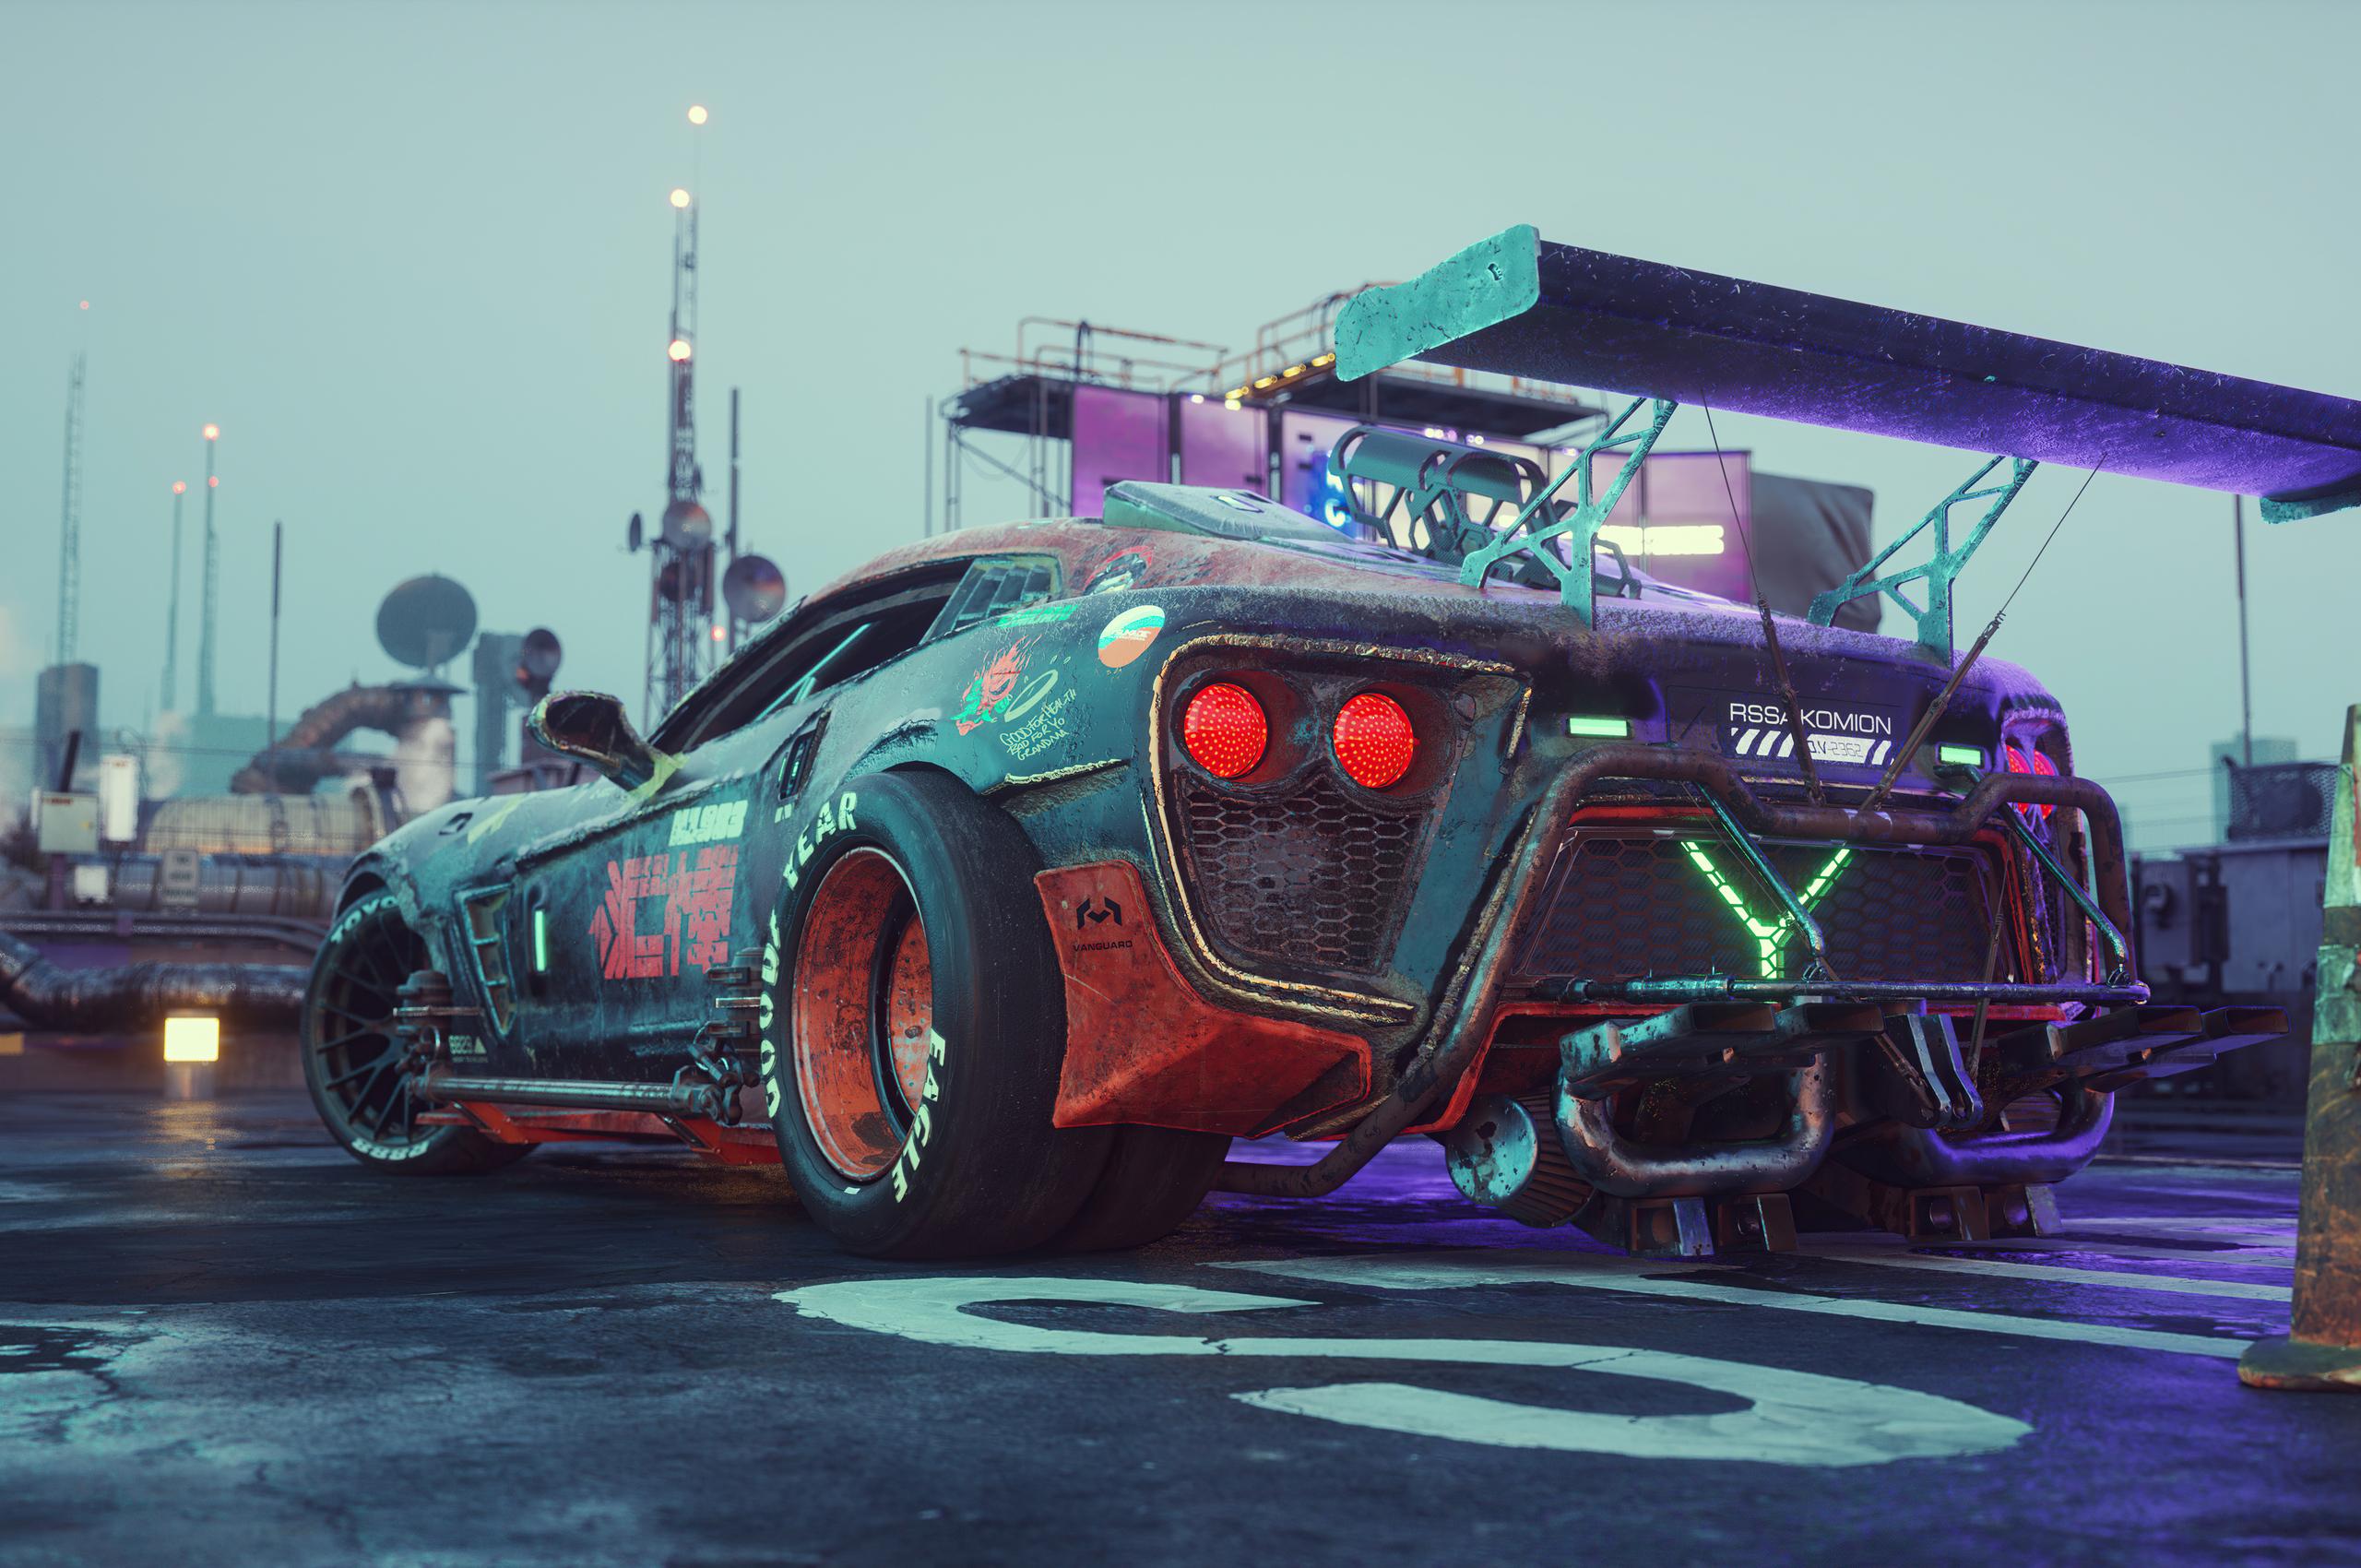 cyberpunkish-flanker-f-concept-car-4k-m1.jpg